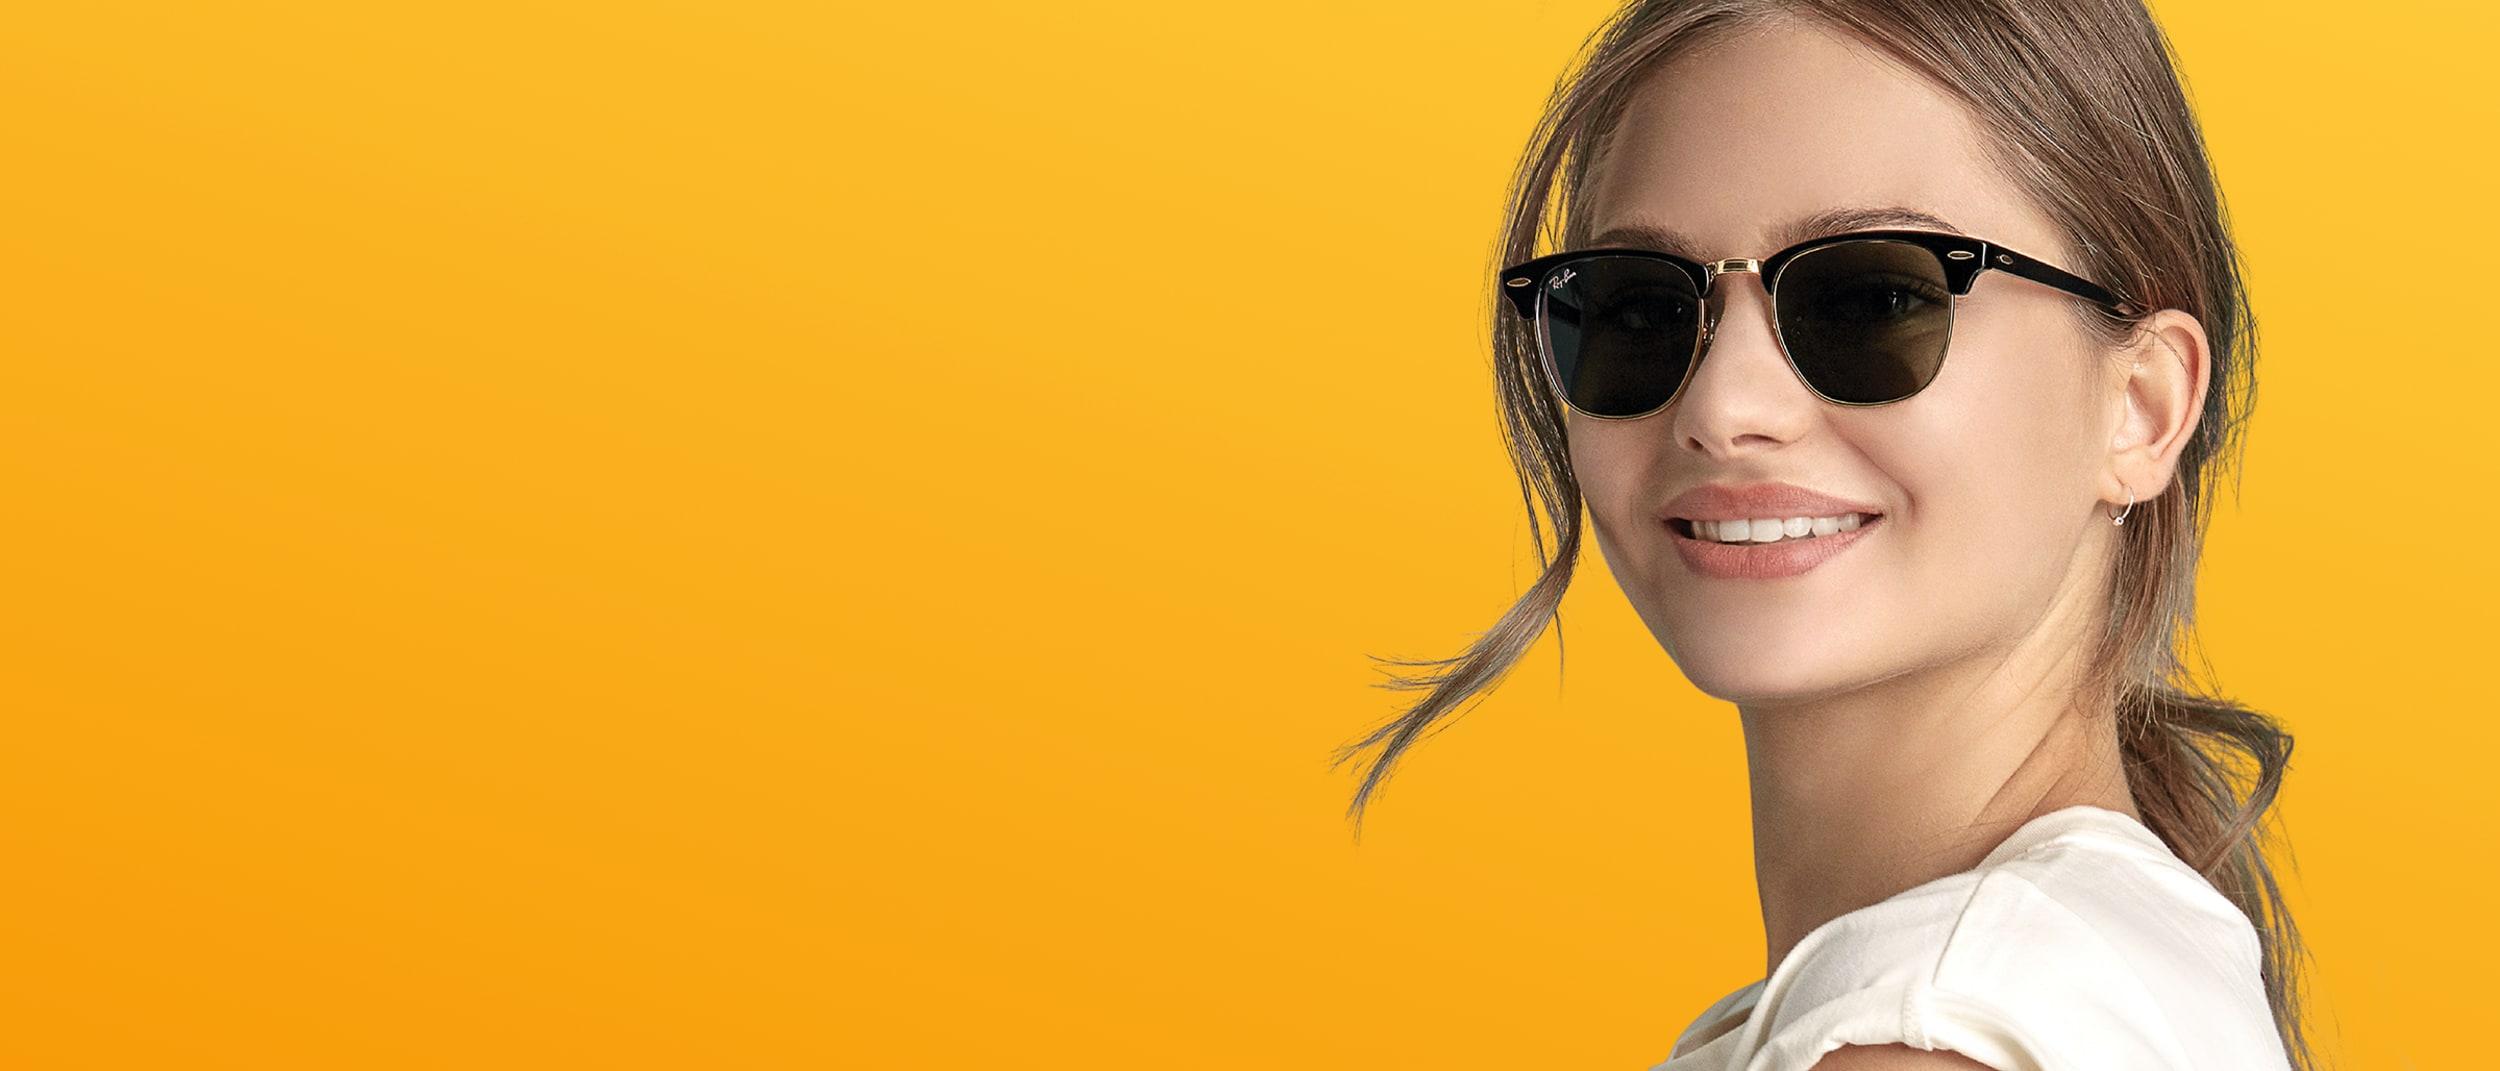 OPSM: 50% off prescription sun lenses*